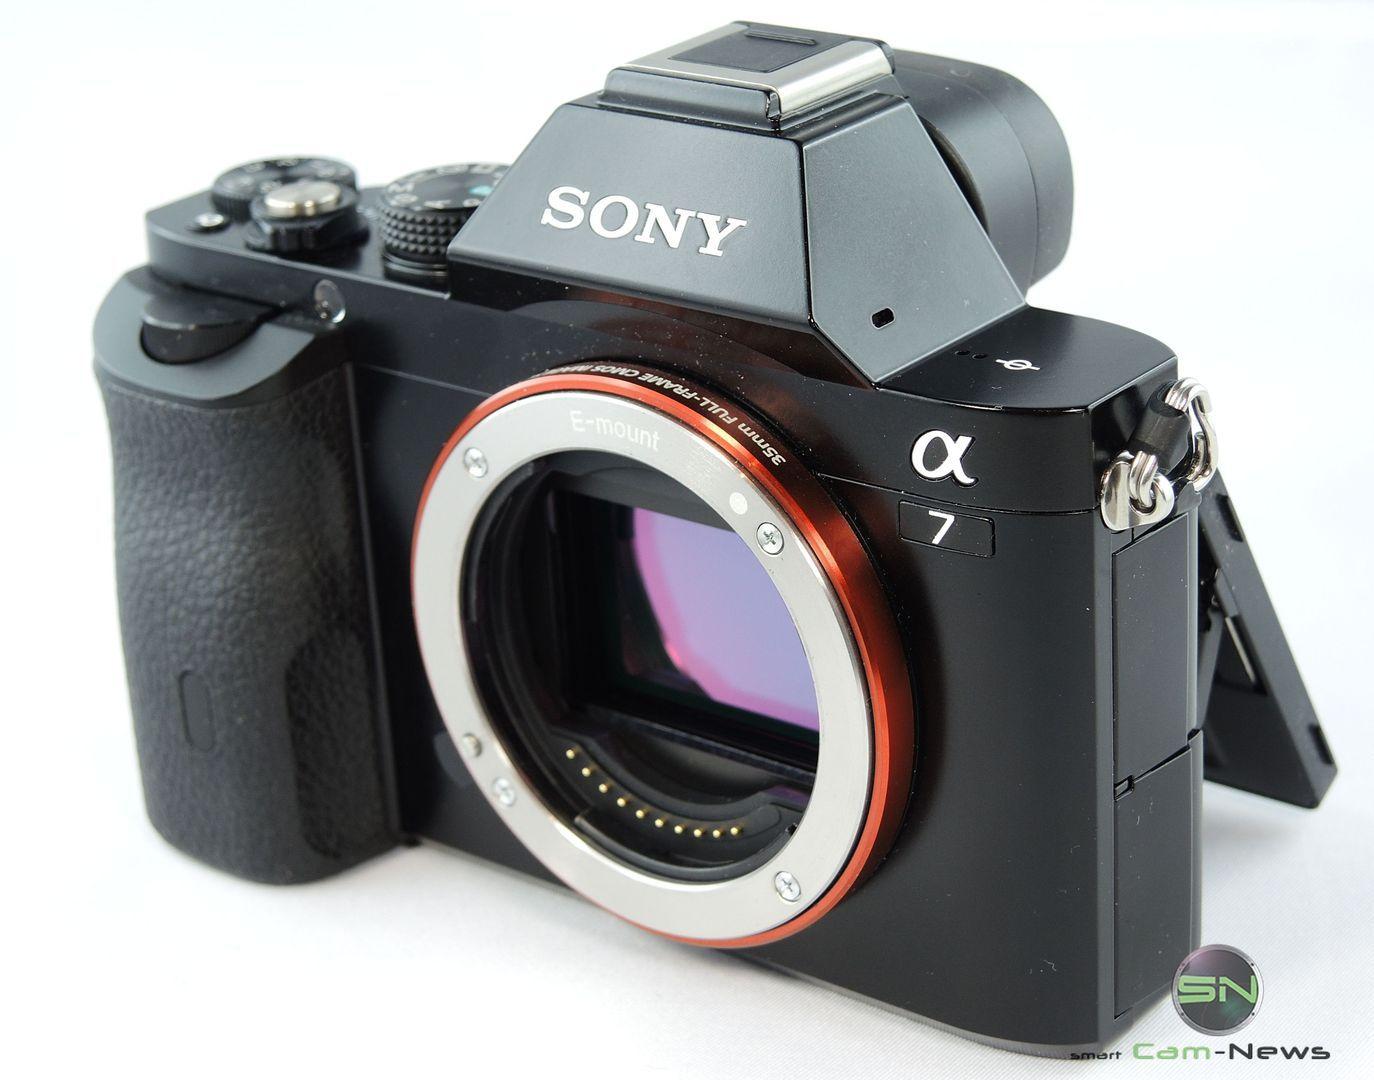 REISE nach VENEDIG: Sony Alpha 7 – Vollformat trifft Systemkamera